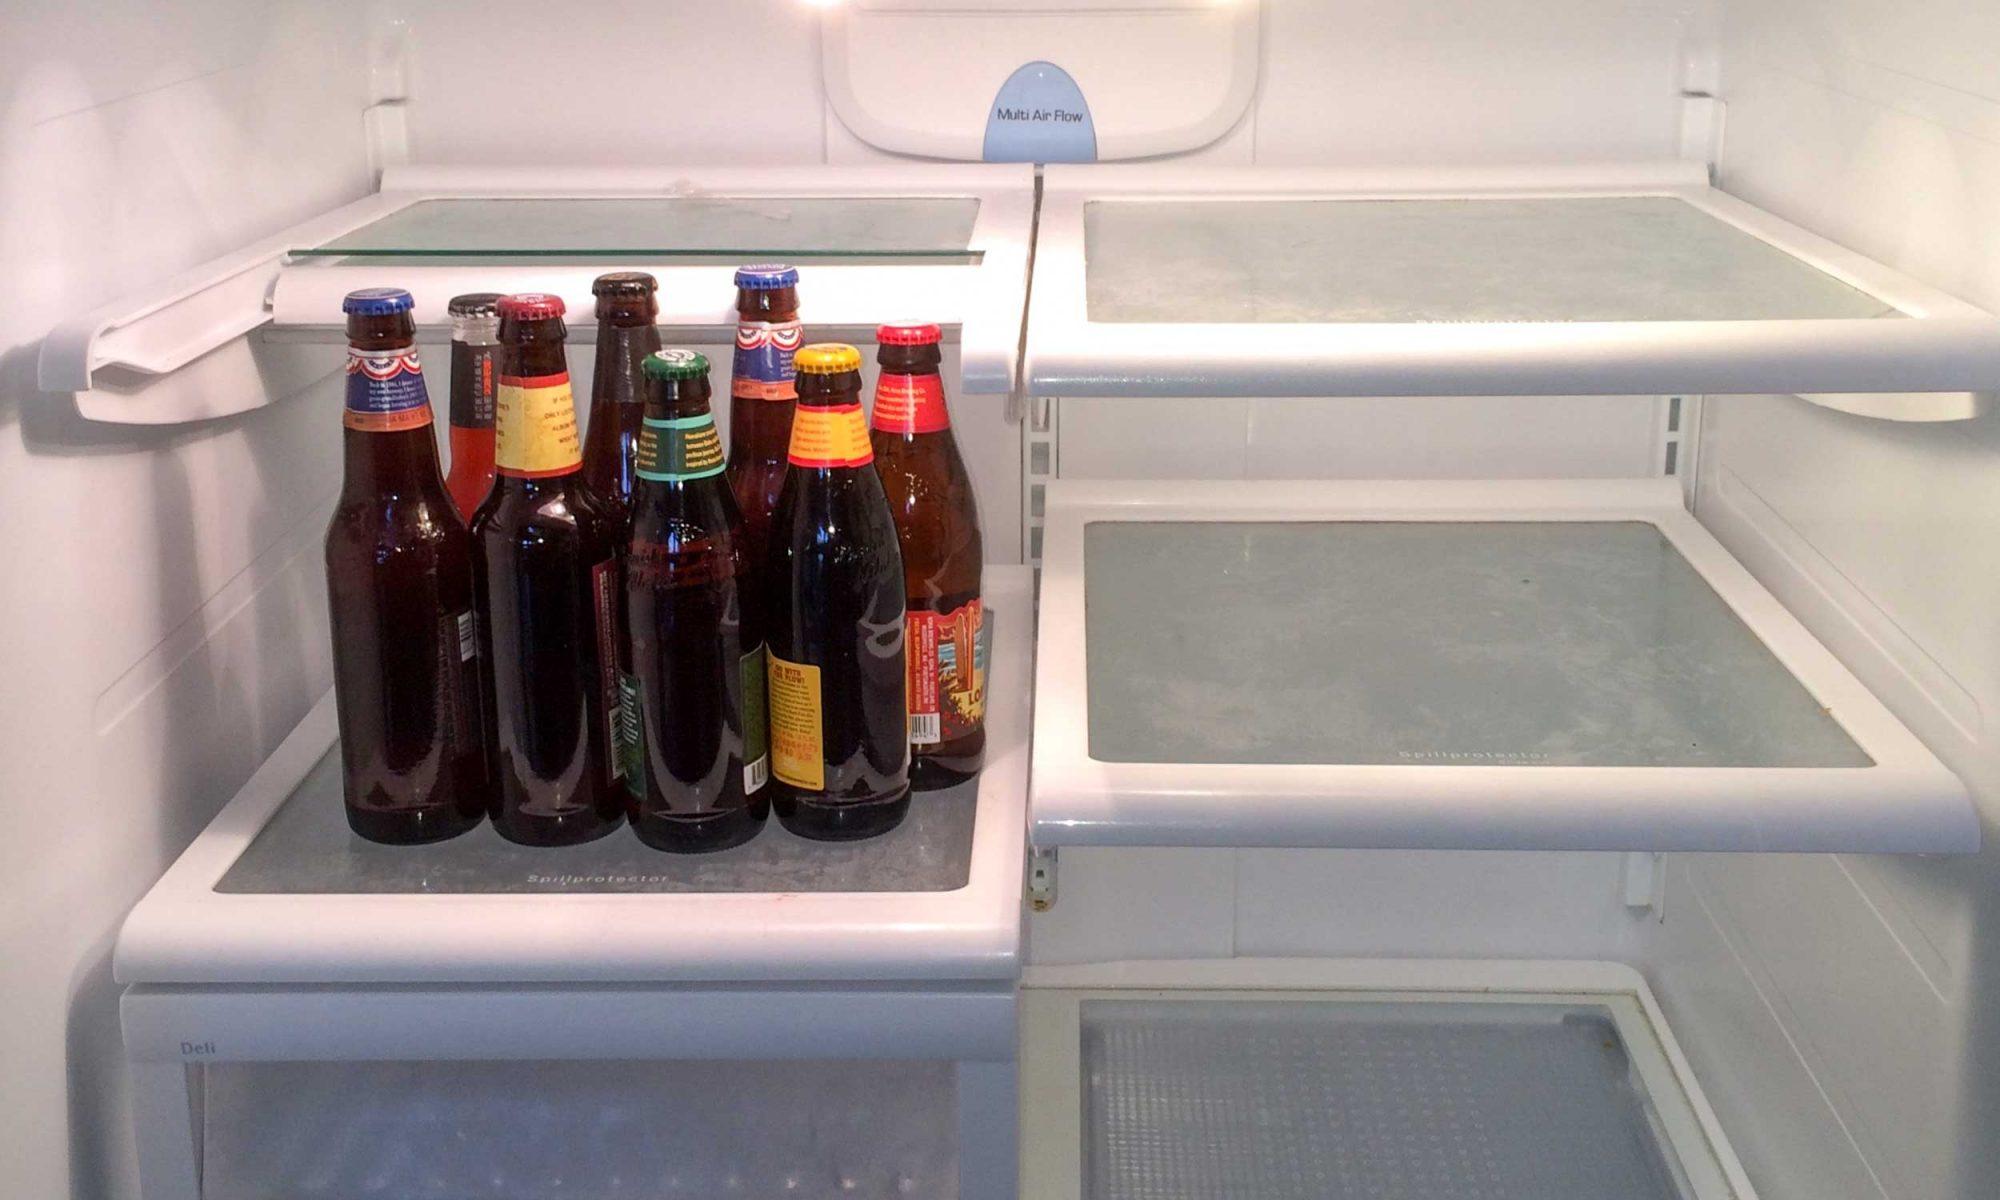 Bottles of beer in fridge